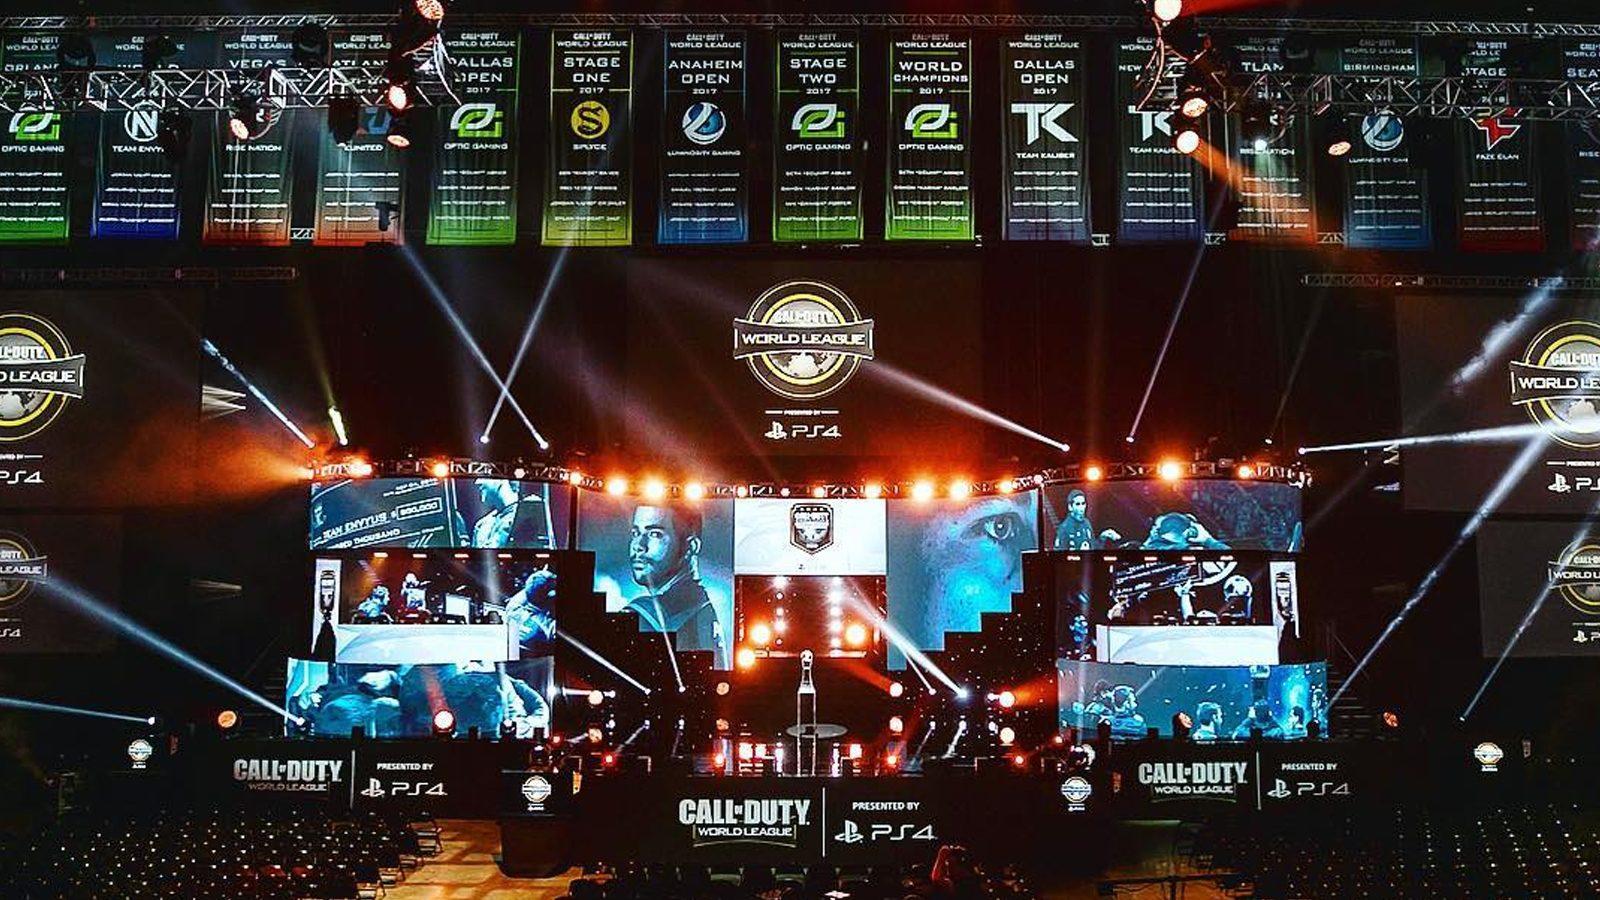 Call of duty esports betting hub championship 13 14 betting sites